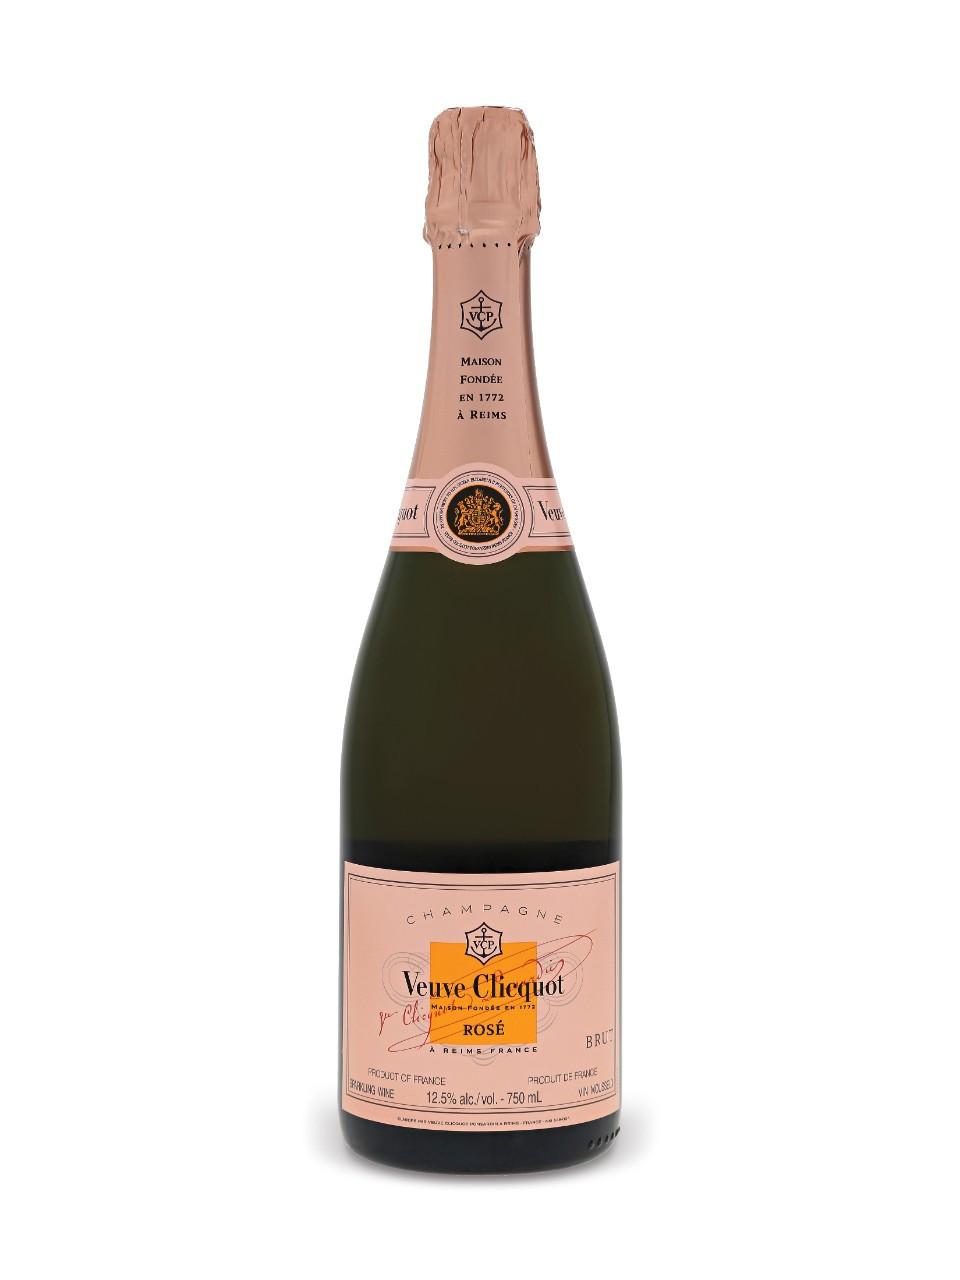 Veuve clicquot rose champagne pinot noir/chardonnay